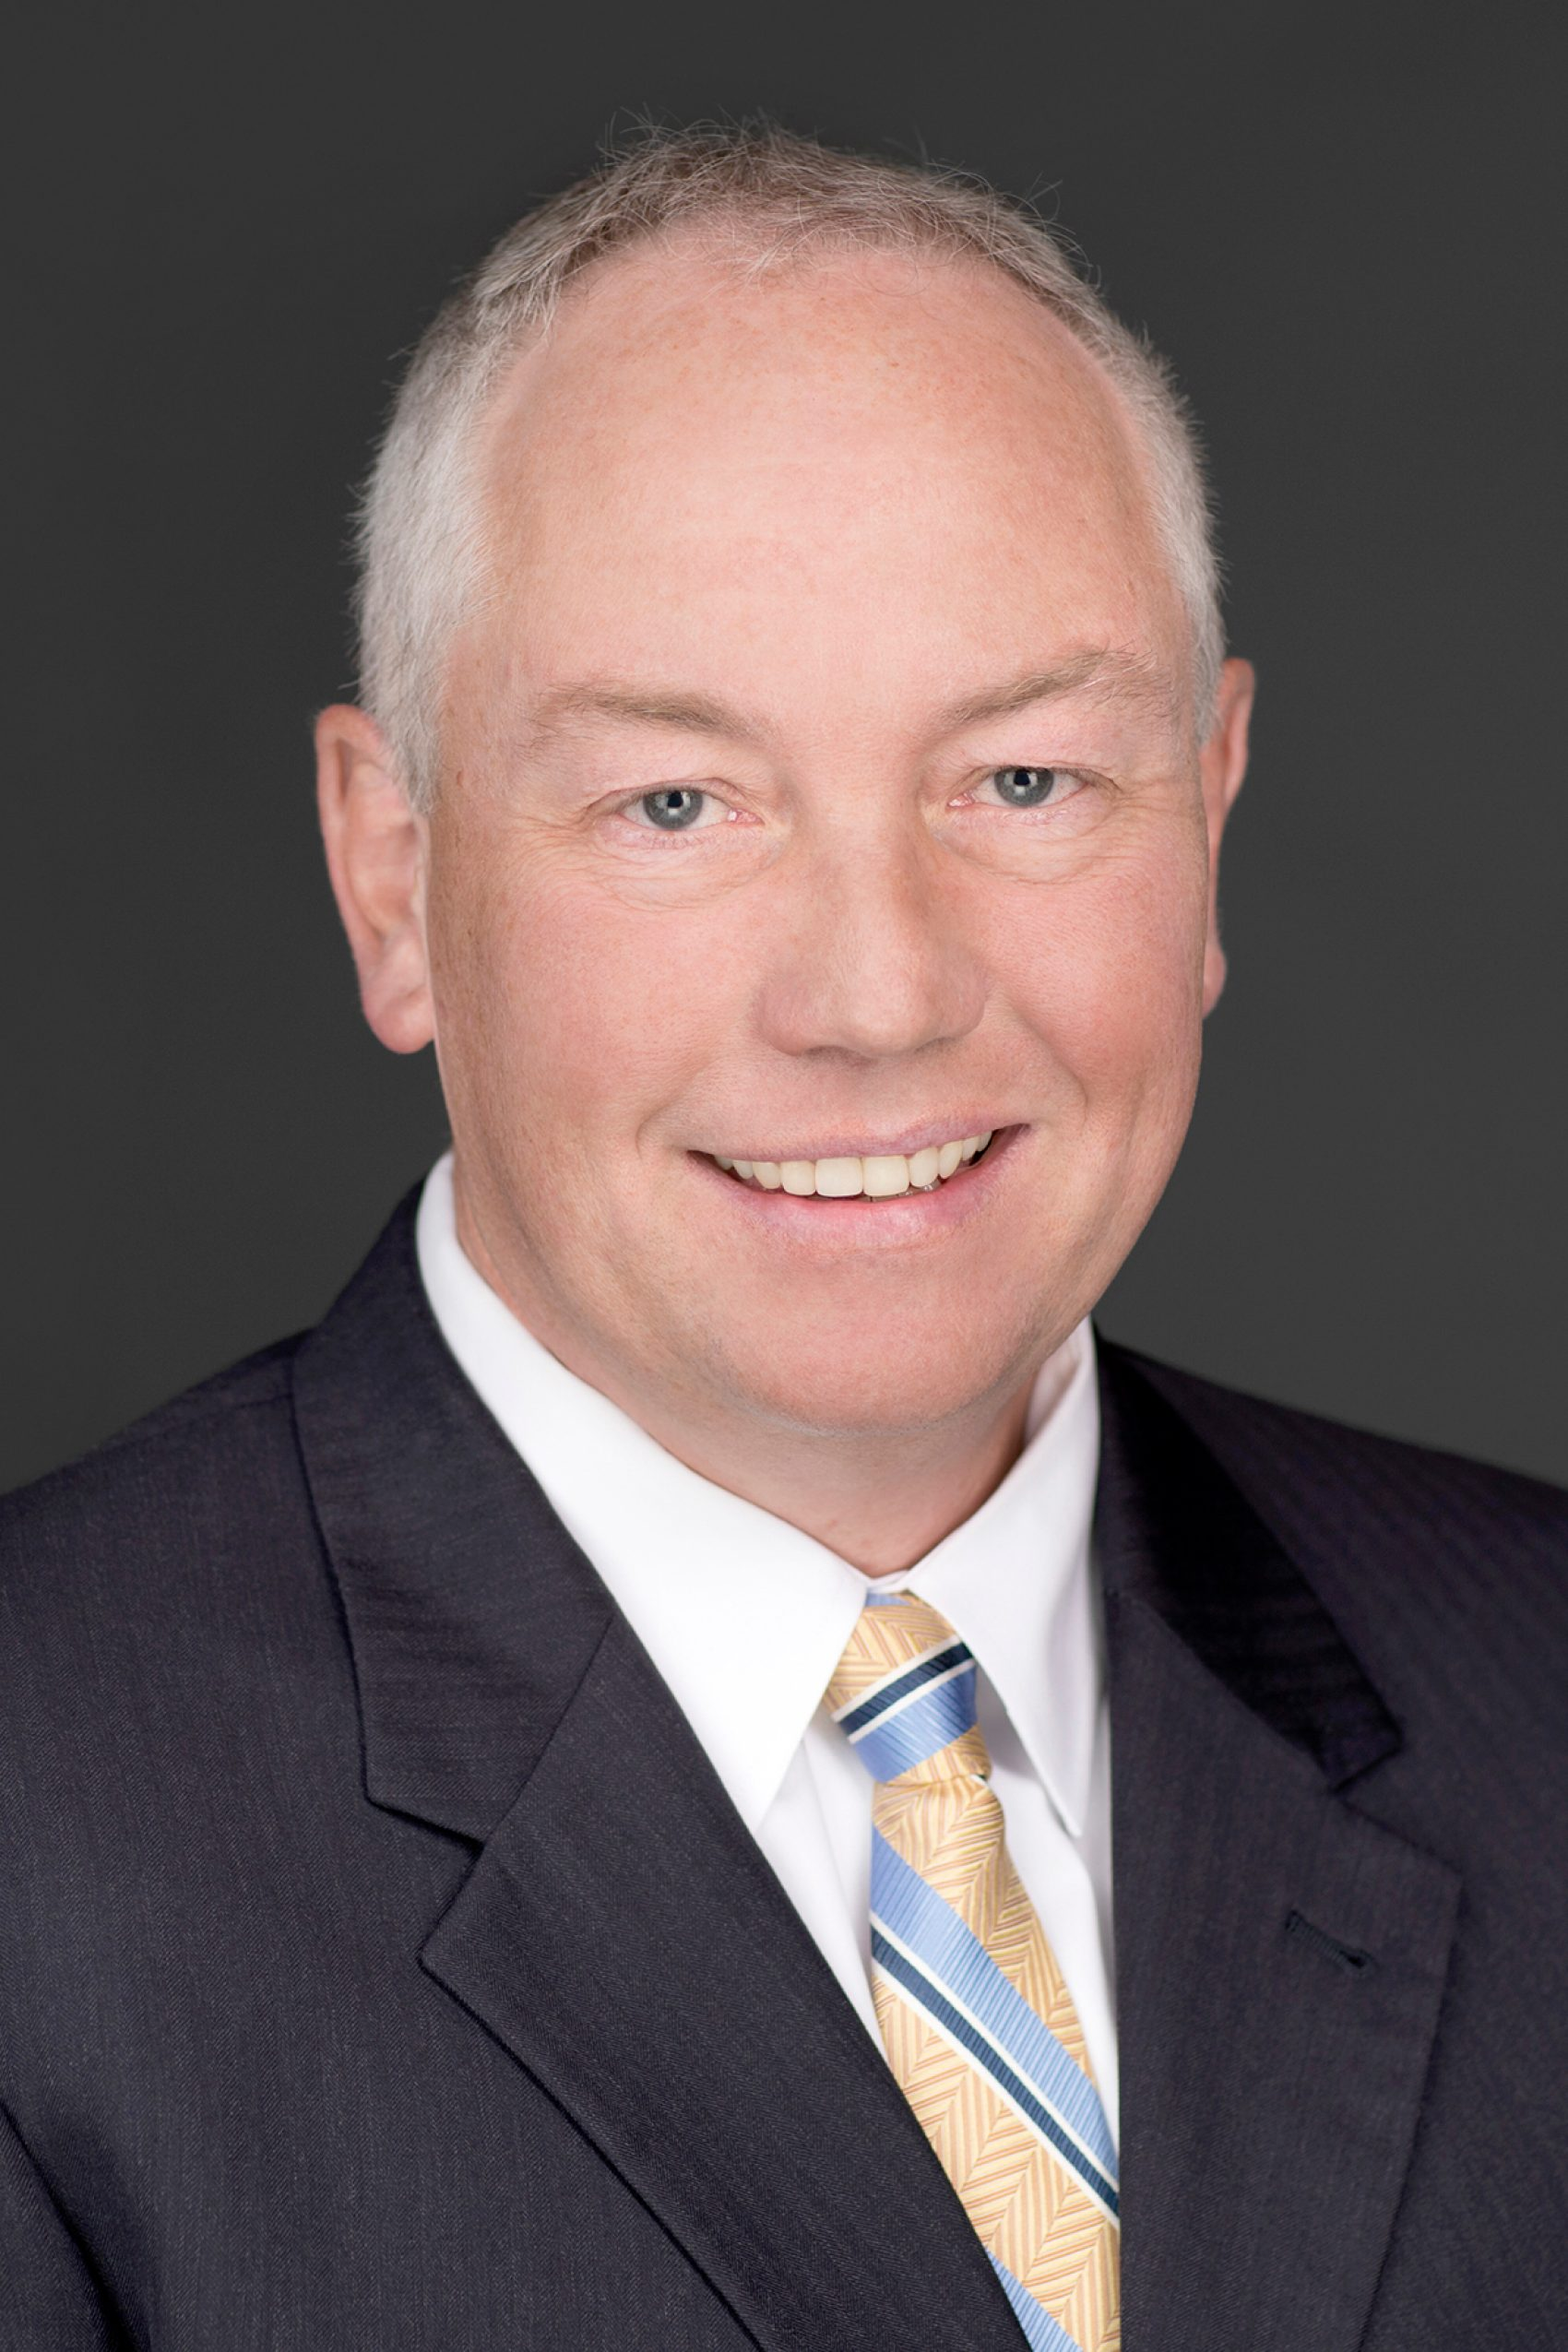 Greg Eichhorn